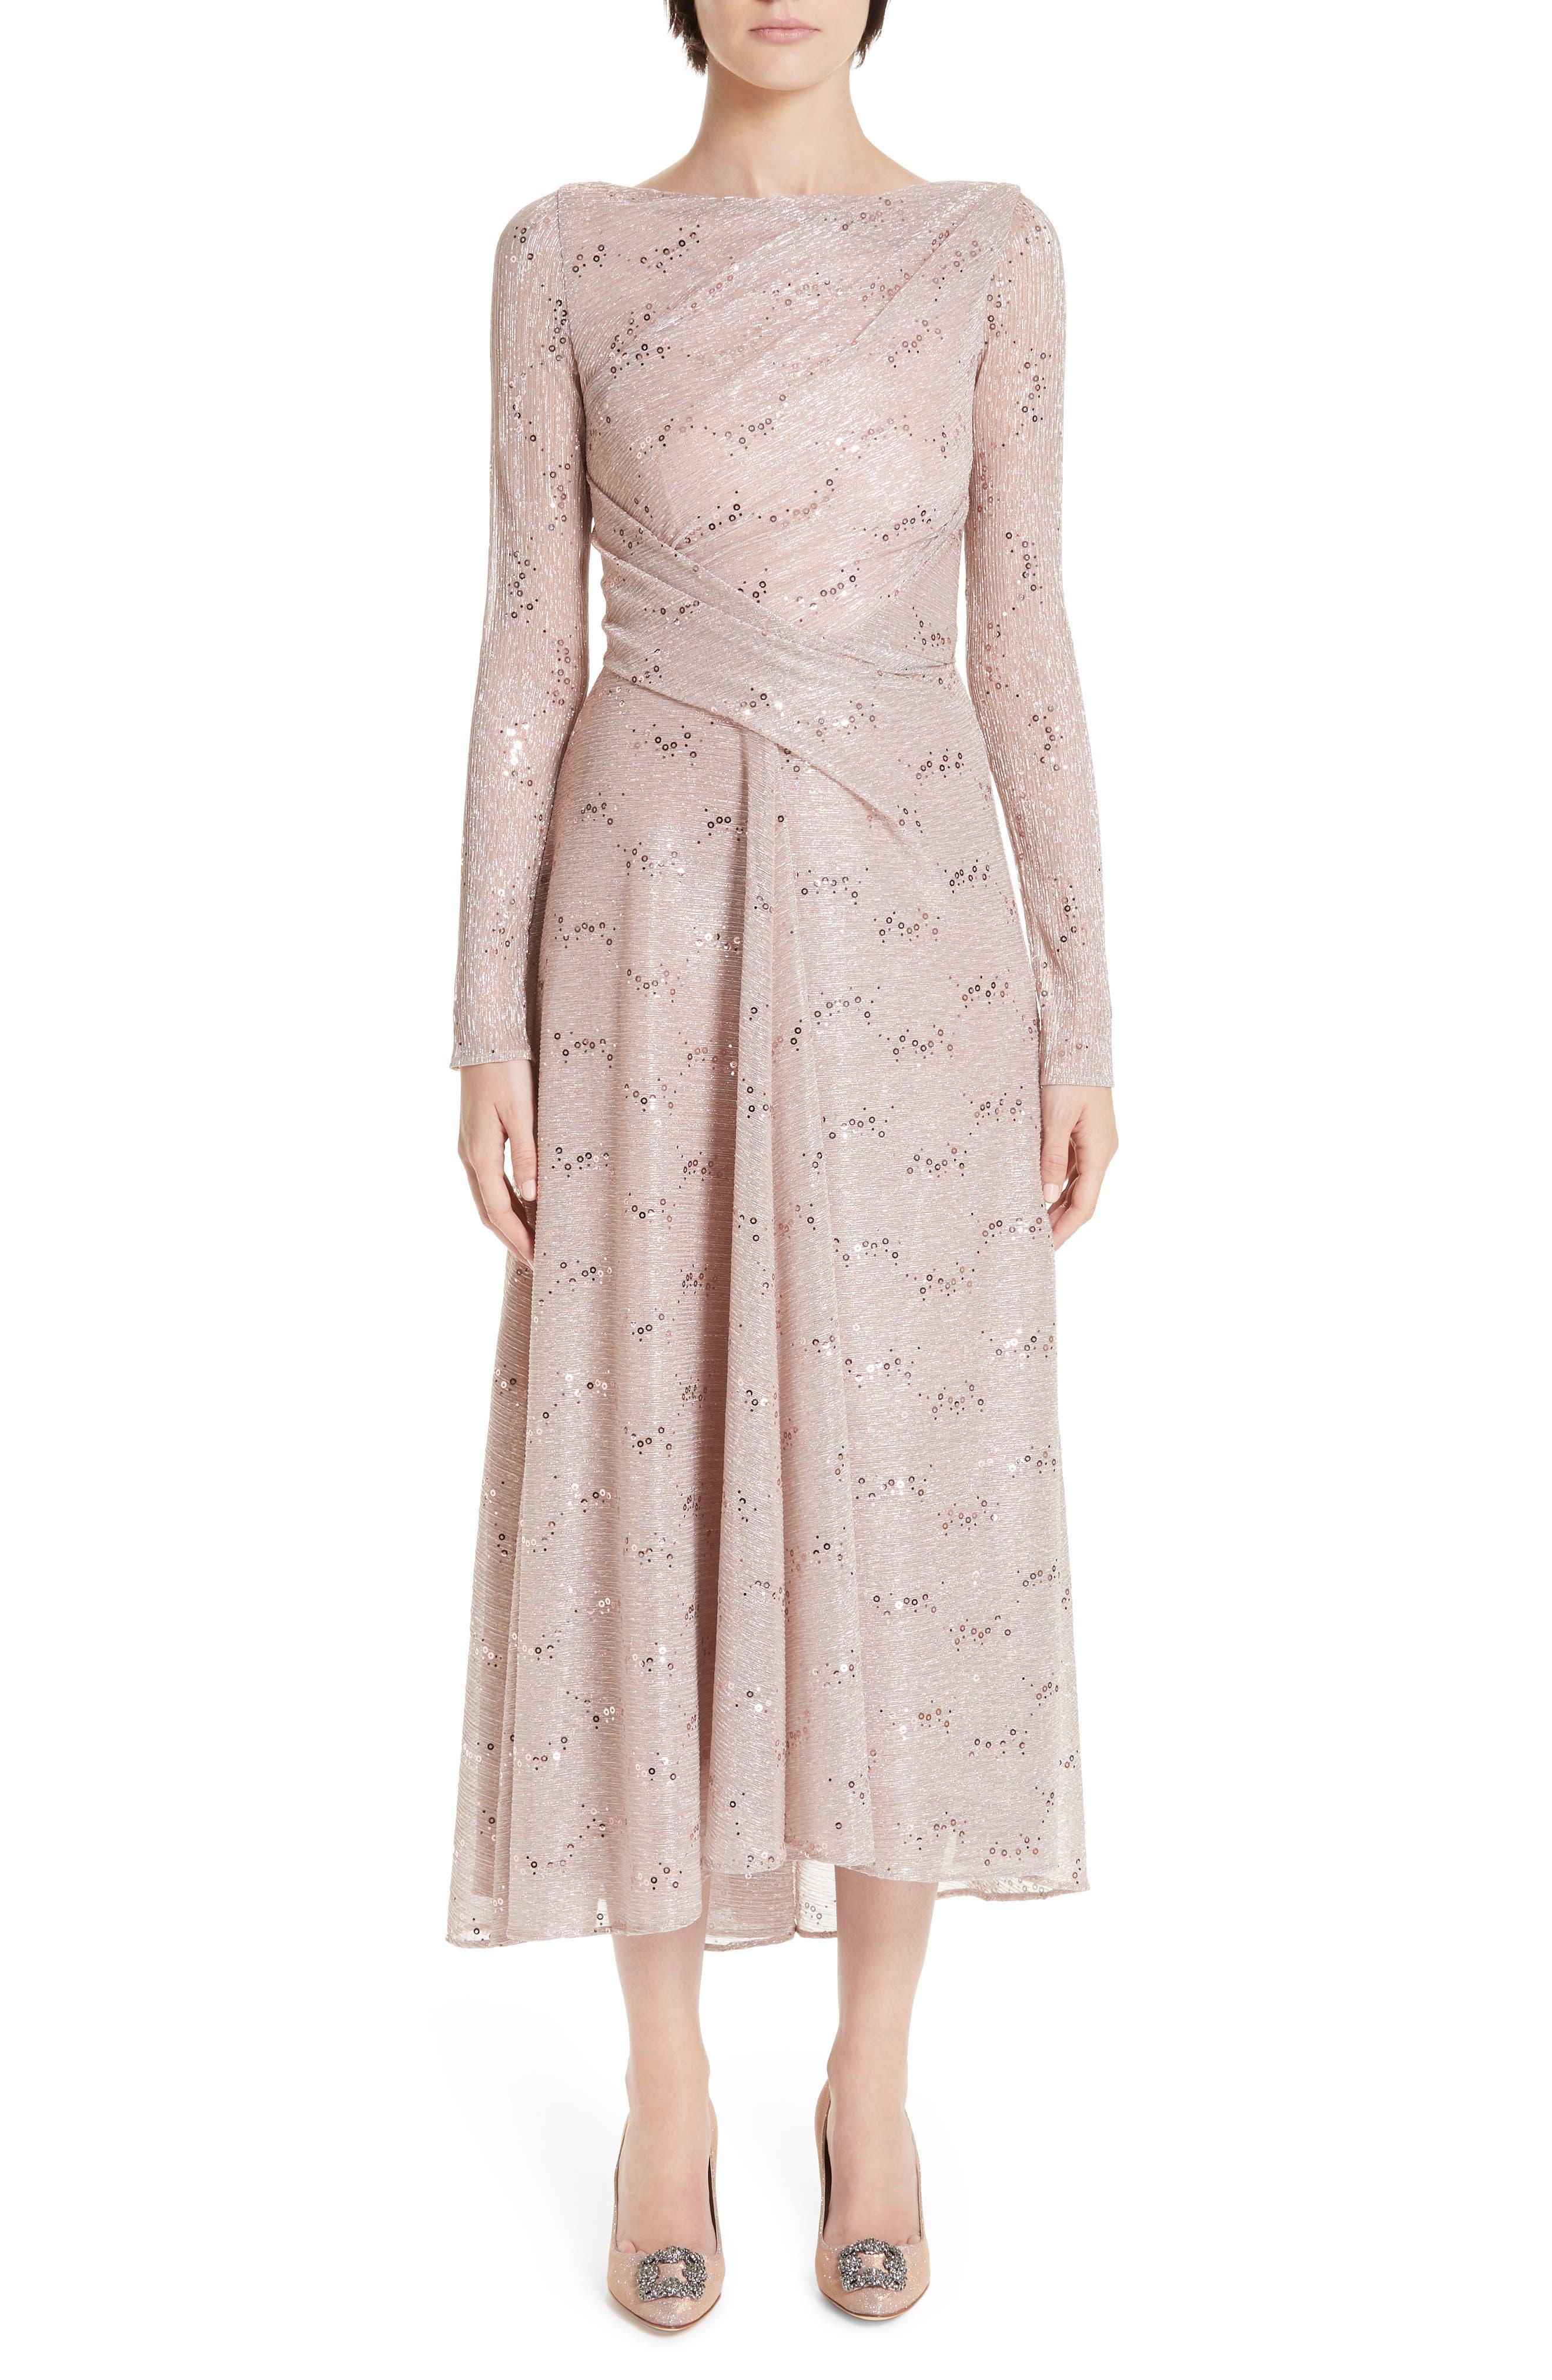 Talbot Runhof Sequin Metallic Voile Tea Length Dress